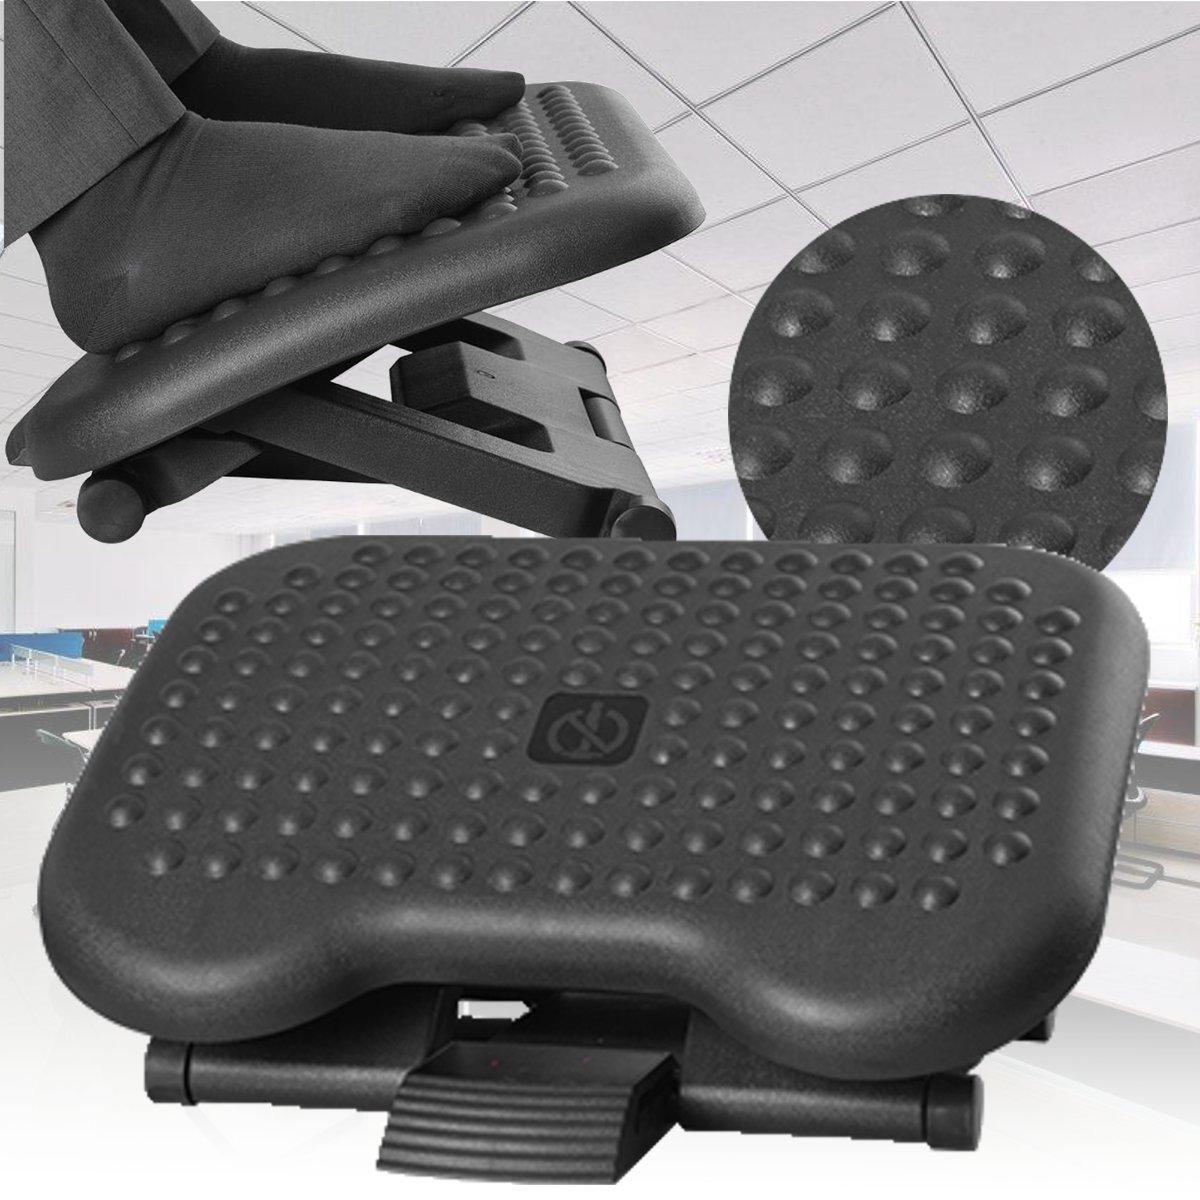 Adjustable Tilting Footrest Under Desk Ergonomic Office Foot Rest Pad Footstool Foot Pegs фото